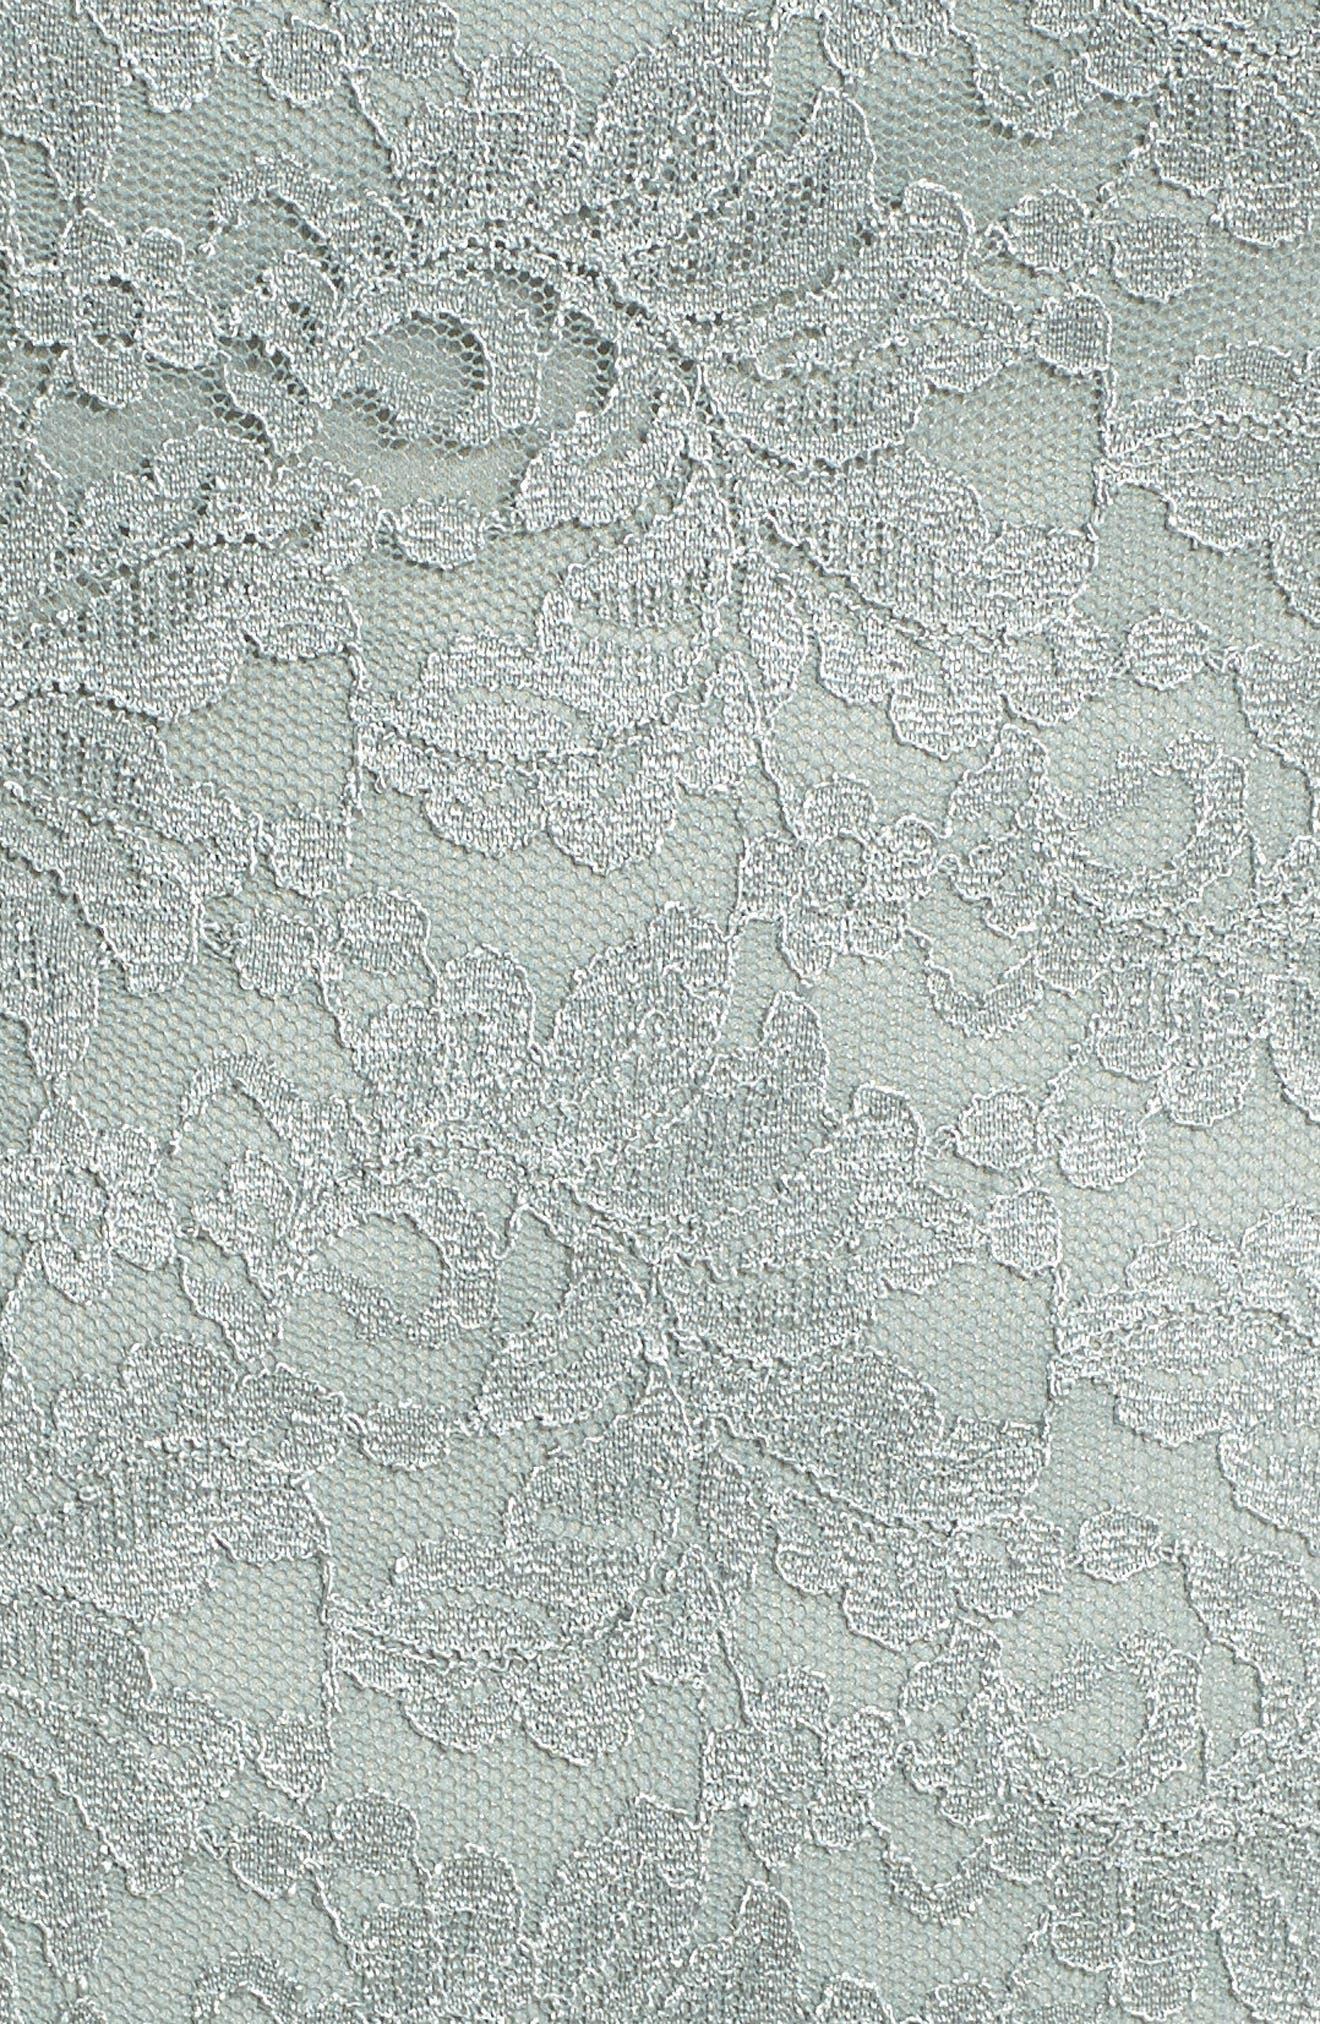 Lace Sheath Dress & Jacket,                             Alternate thumbnail 3, color,                             Ice Sage